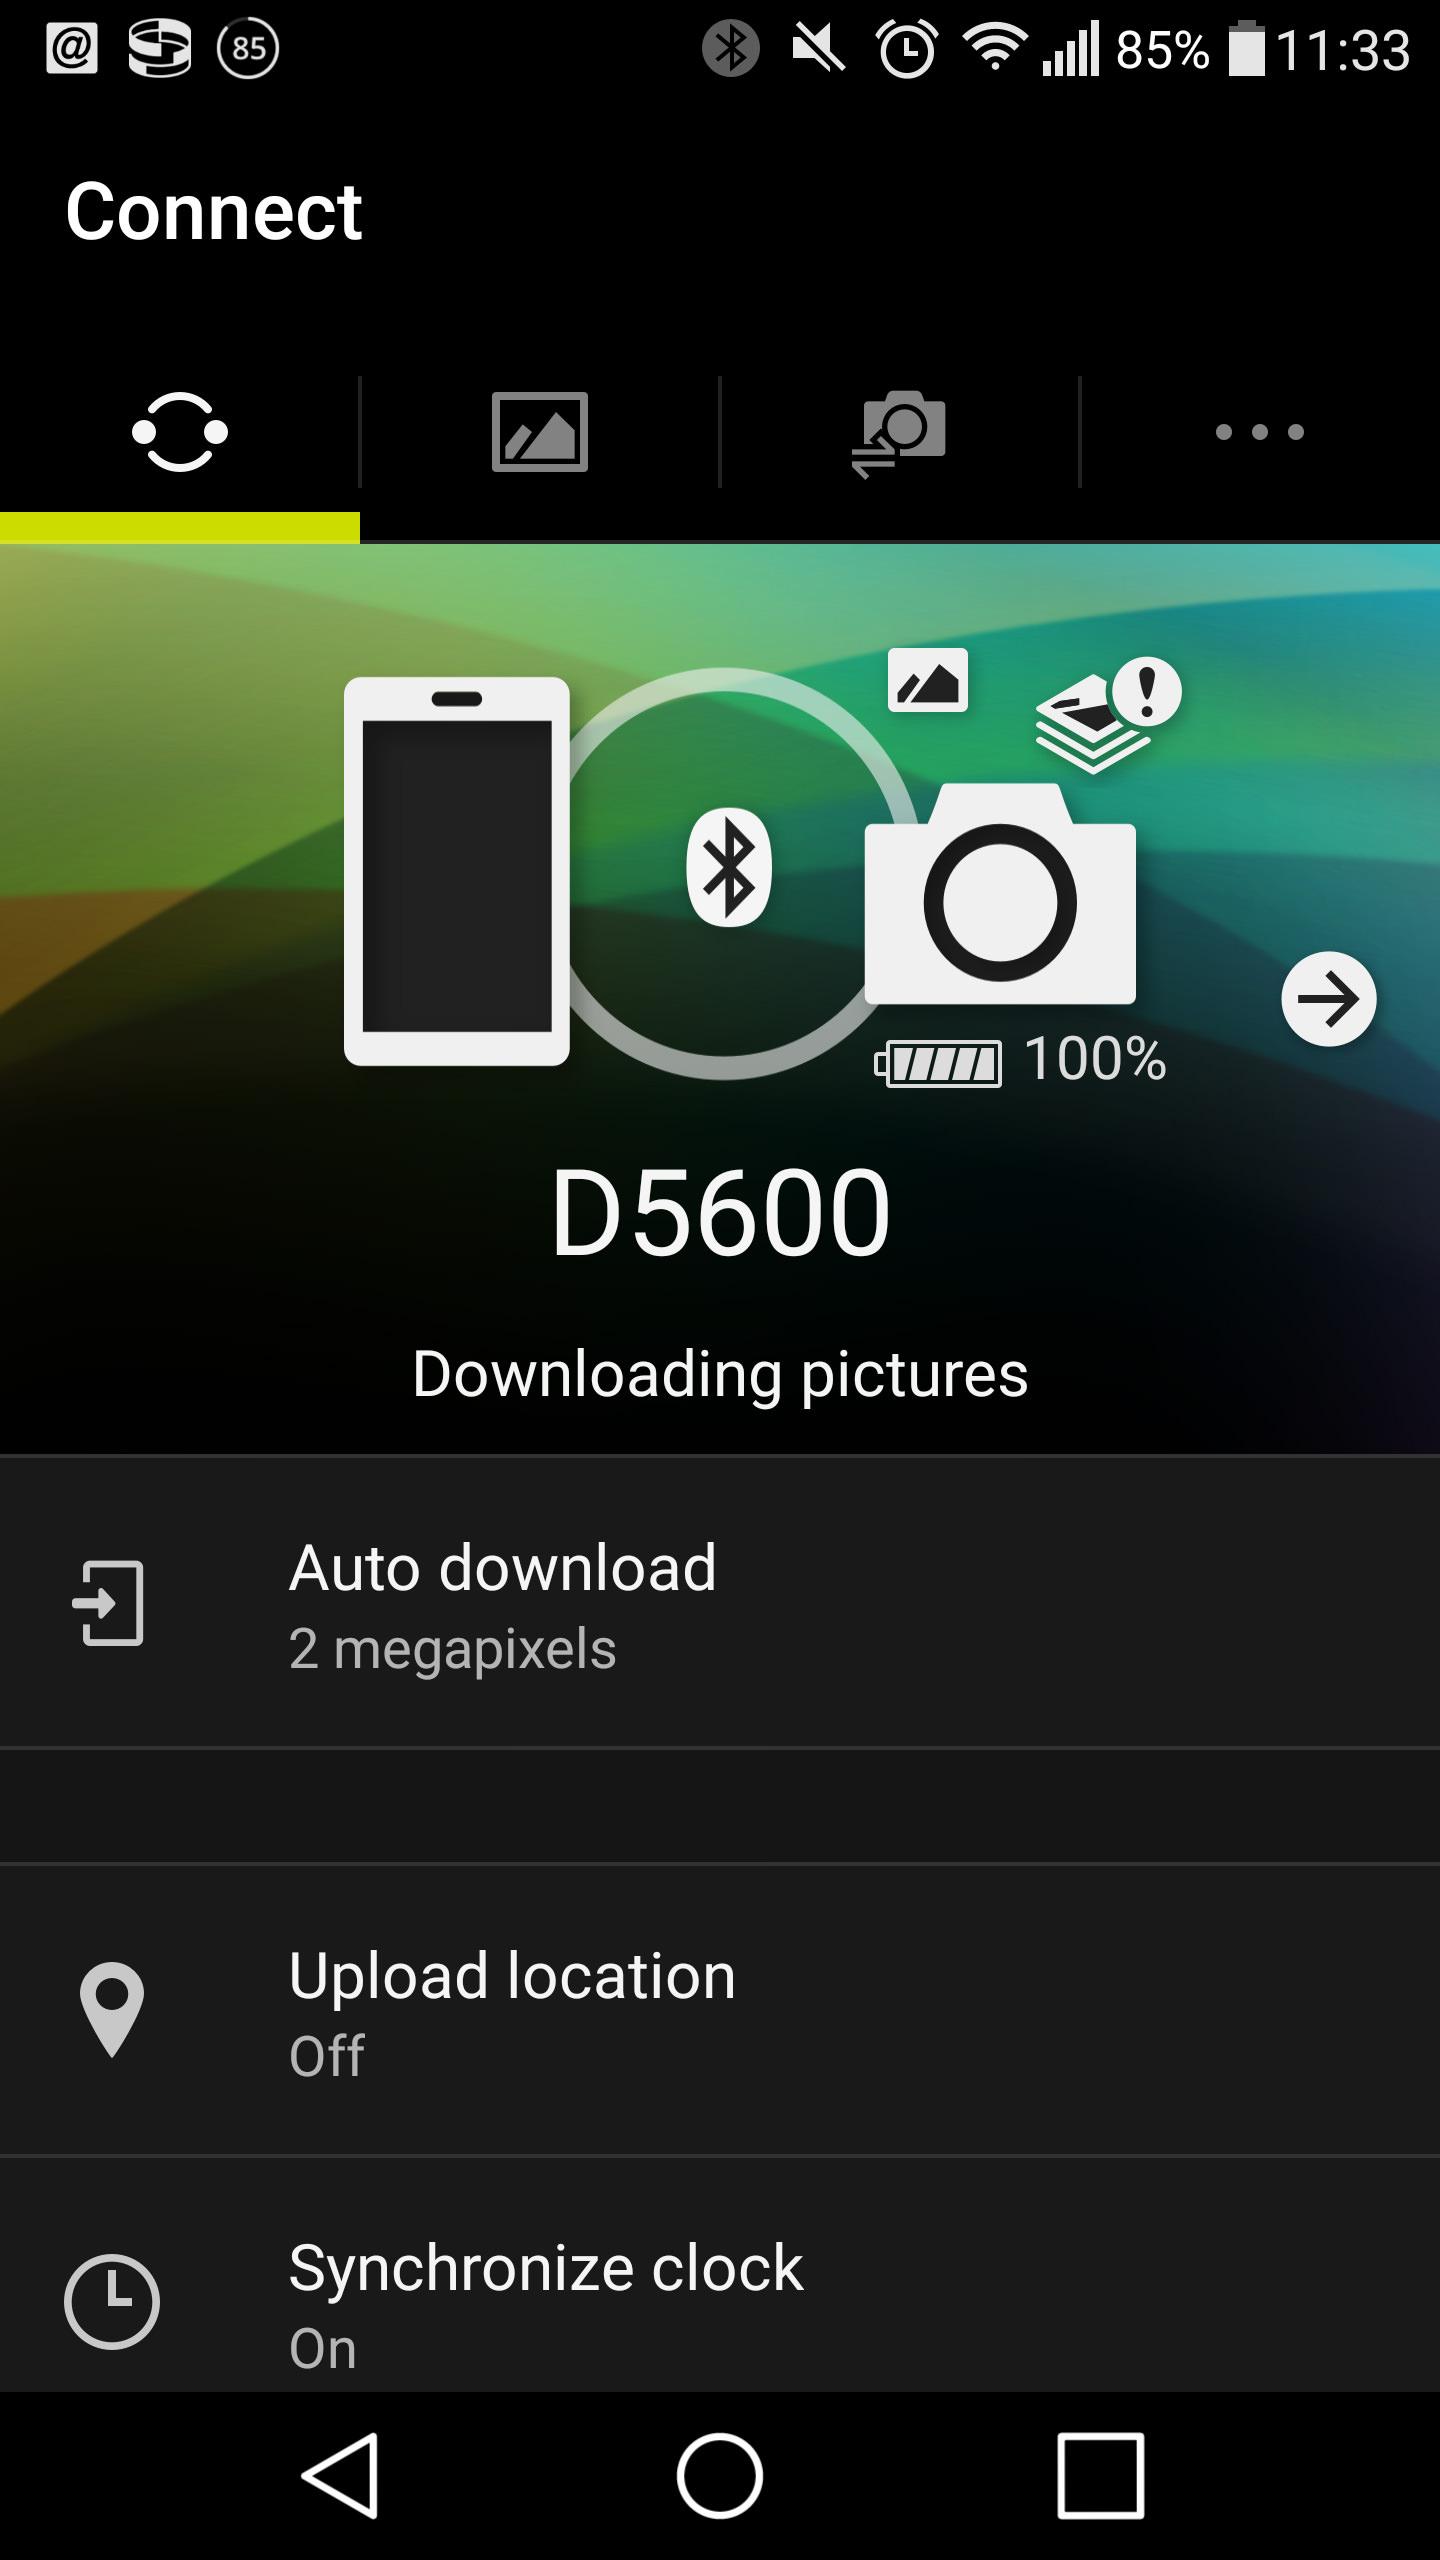 Nikon D5600 DSLR Review | ePHOTOzine